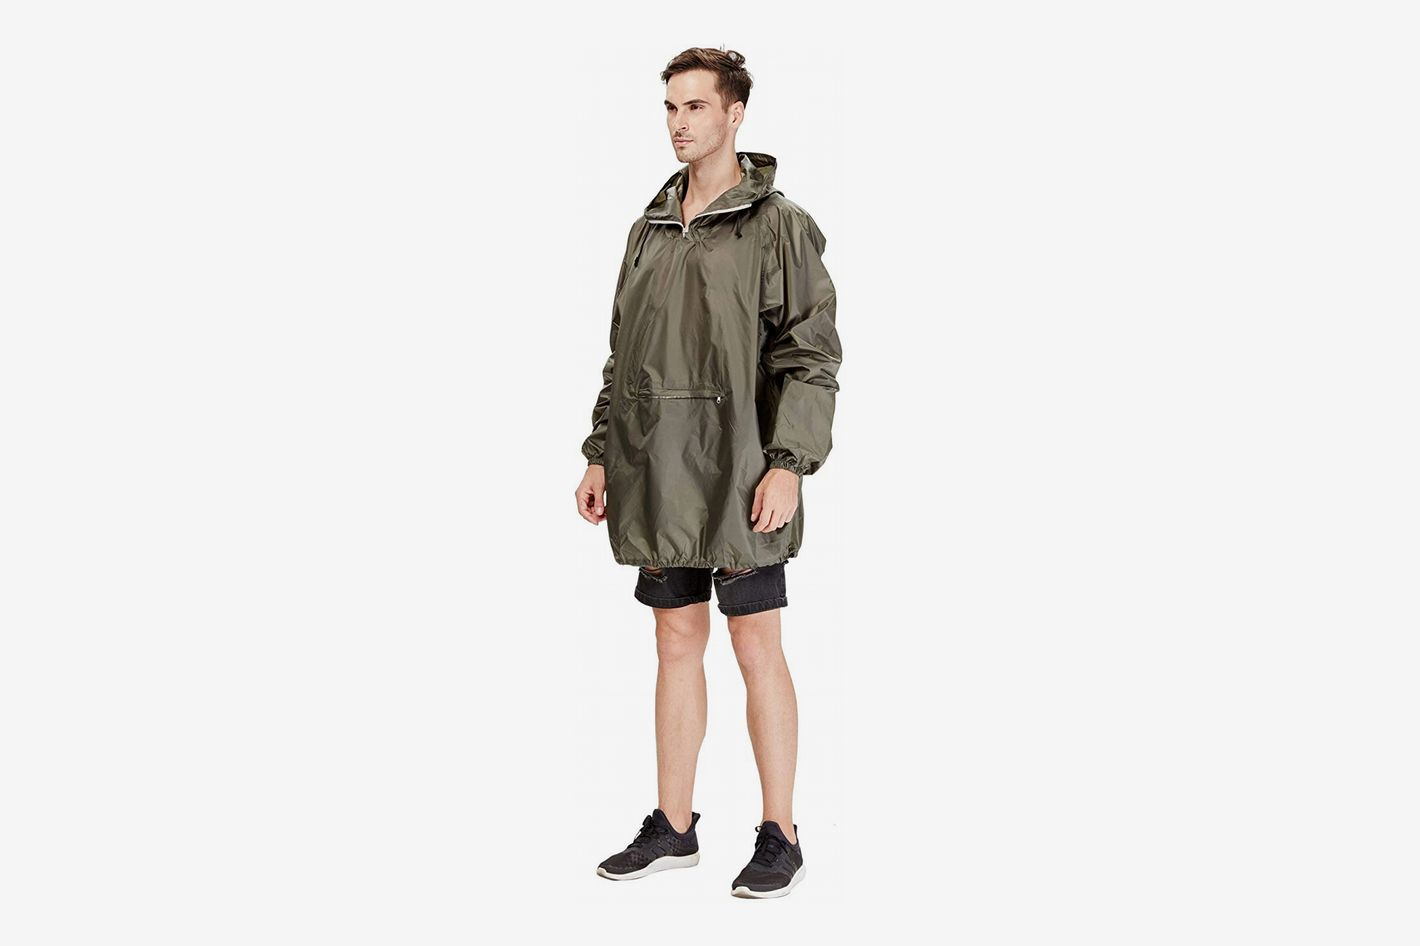 4ucycling Raincoat Easy Carry Rain Coat Jacket